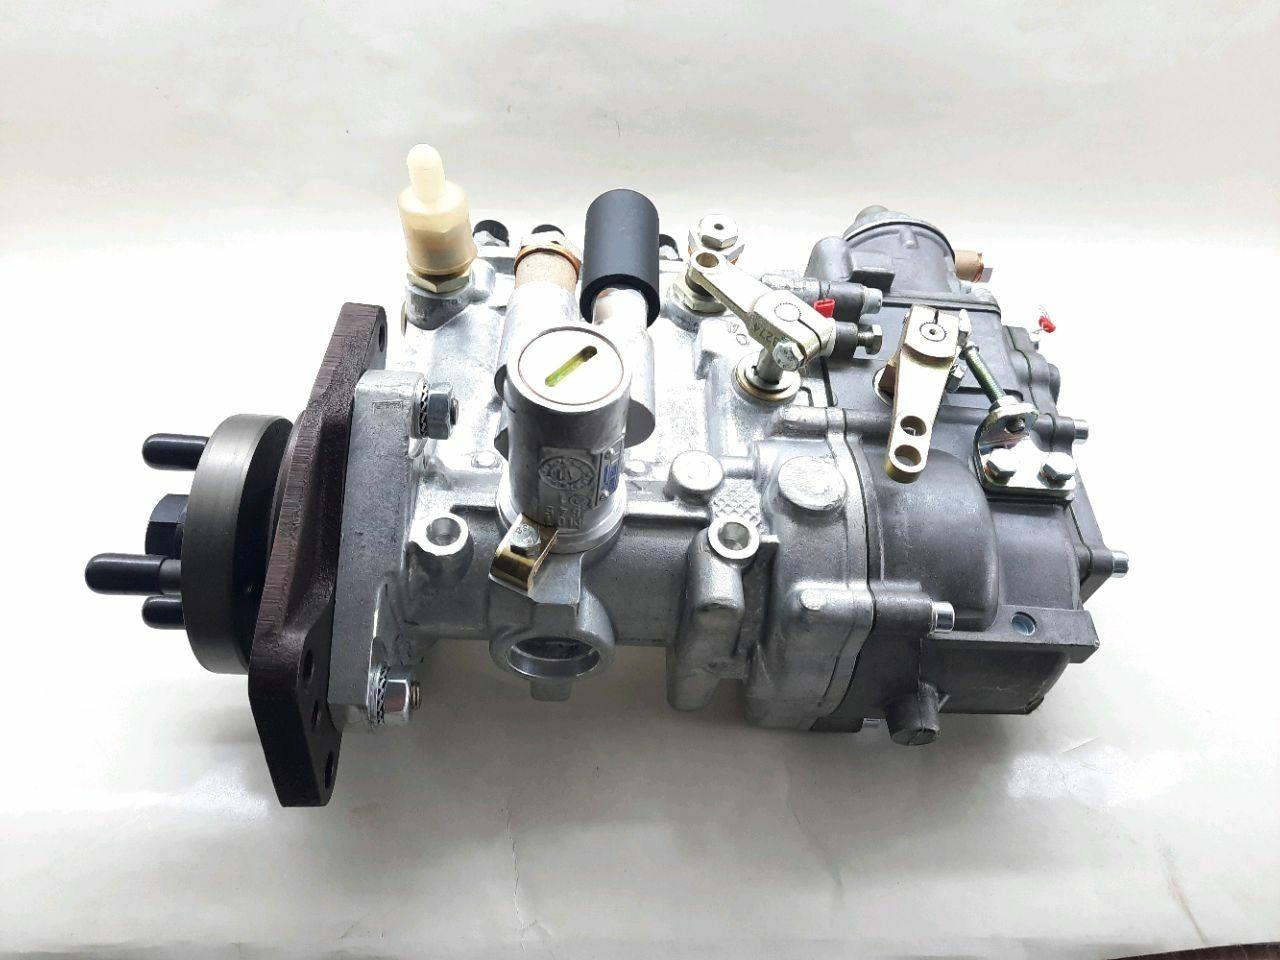 Pompa de injectie D-245 (Motorpal)(MTZ-892)